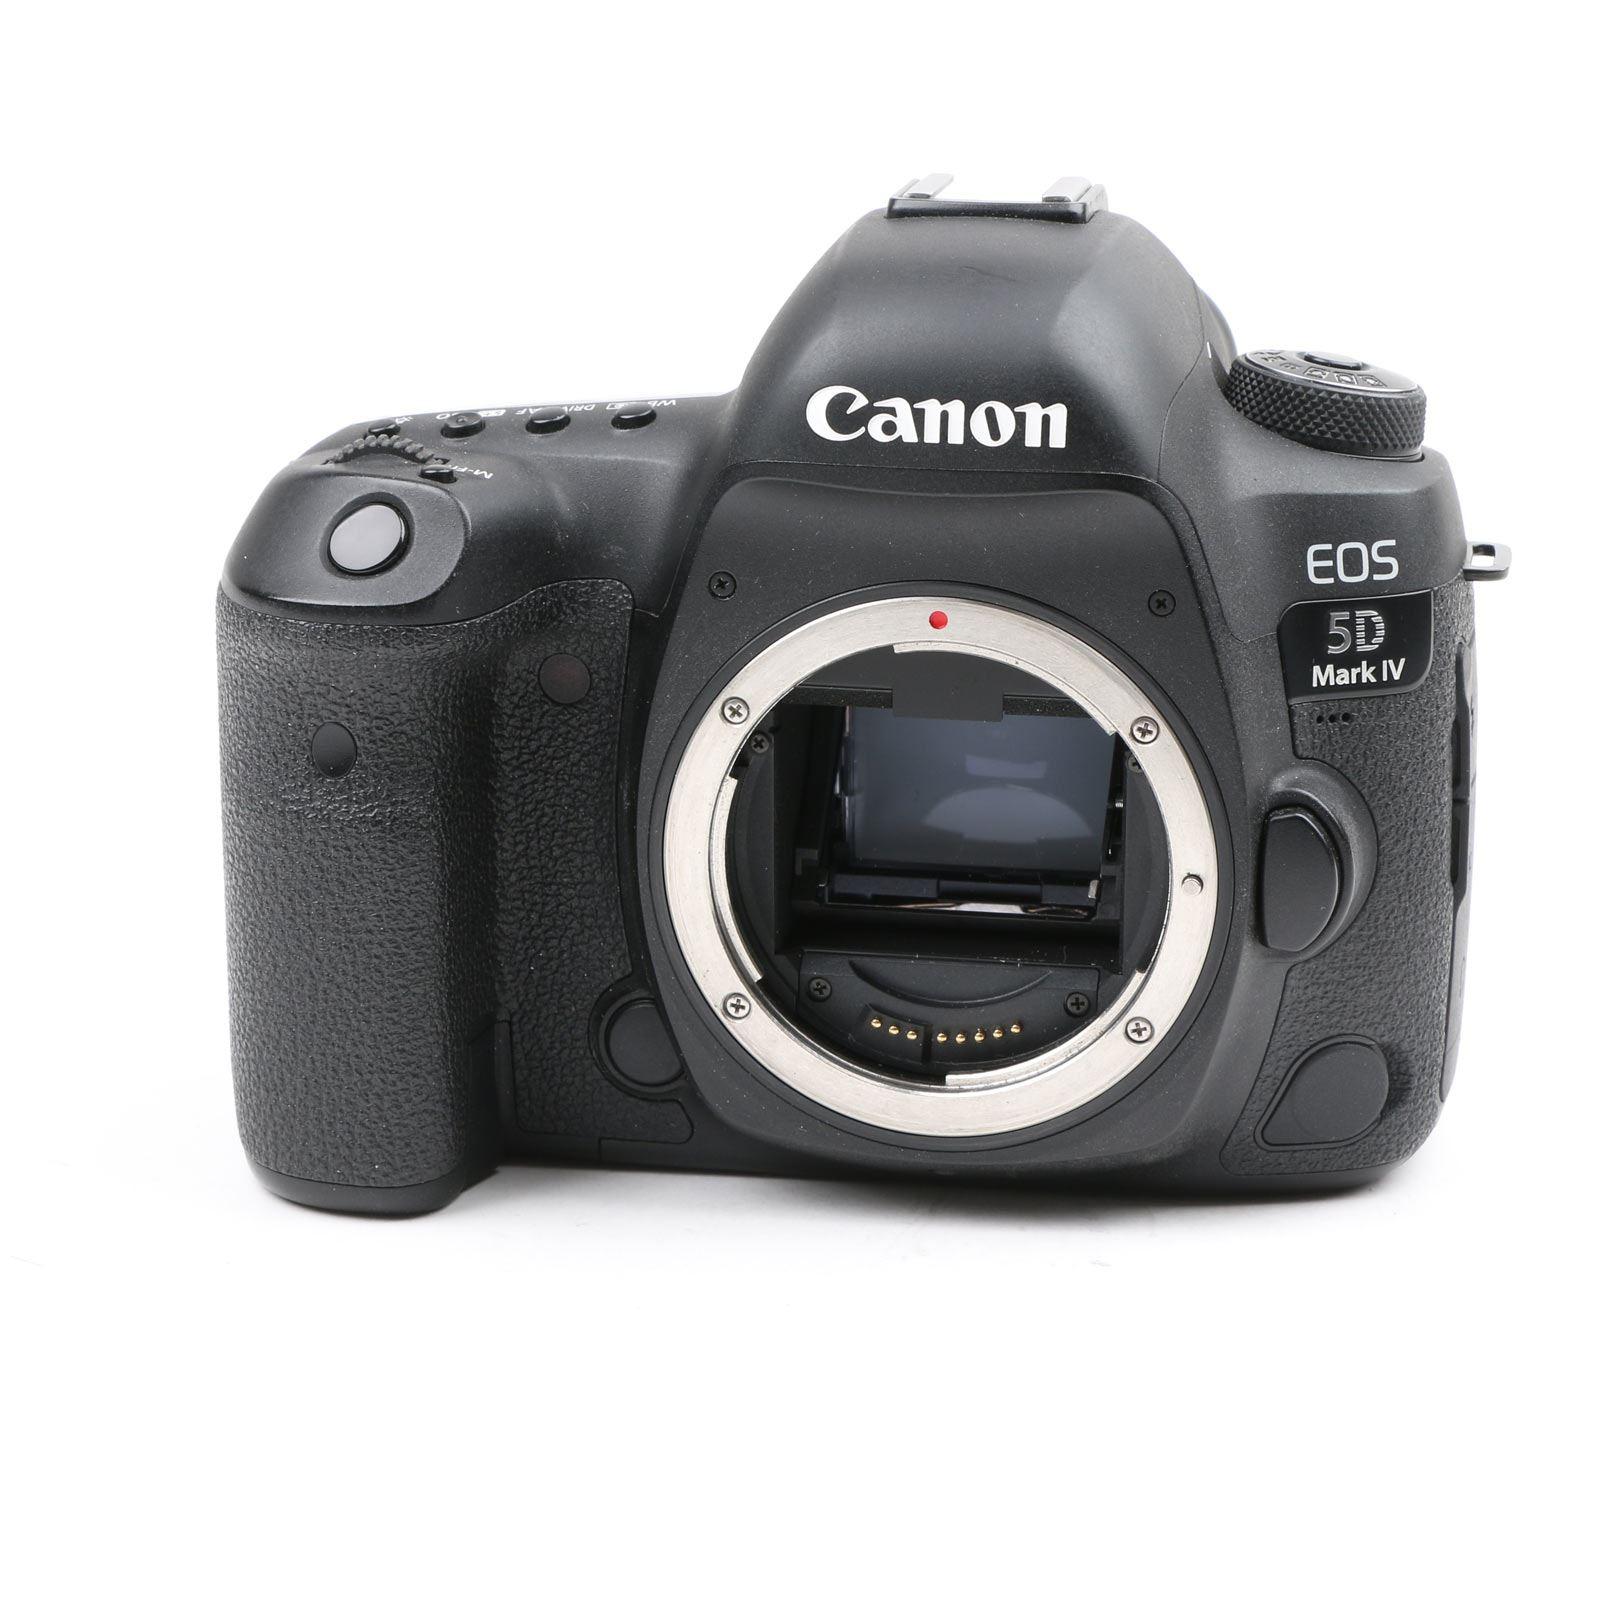 Used Canon EOS 5D Mark IV Digital SLR Camera Body